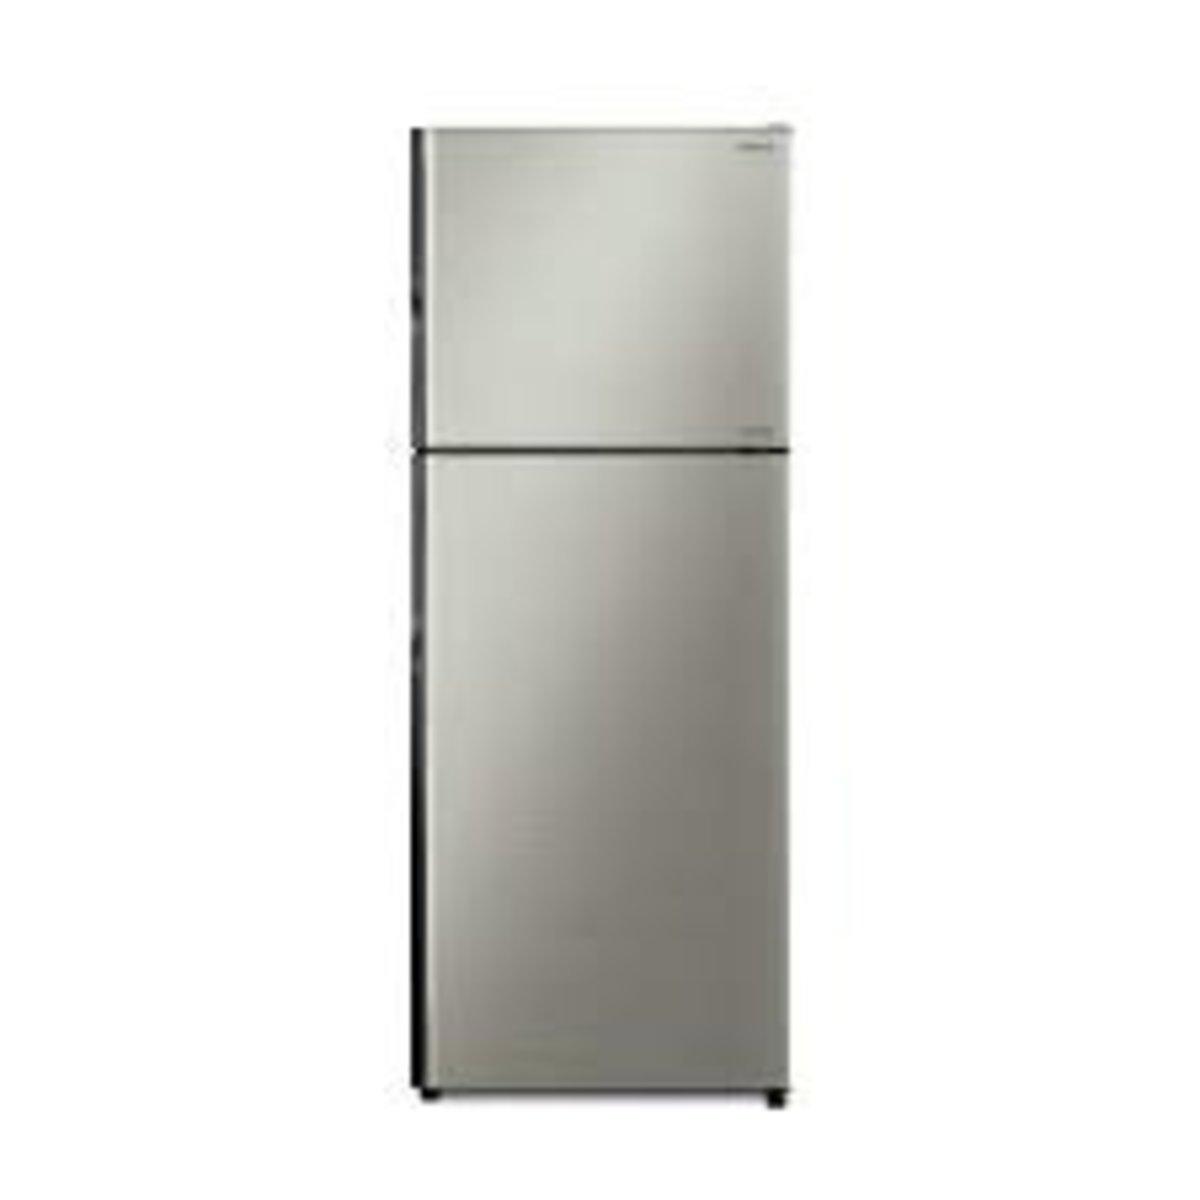 HITACHI R-V480P8H-BSL 408L 2-door Refrigerator(Brilliant Silver)